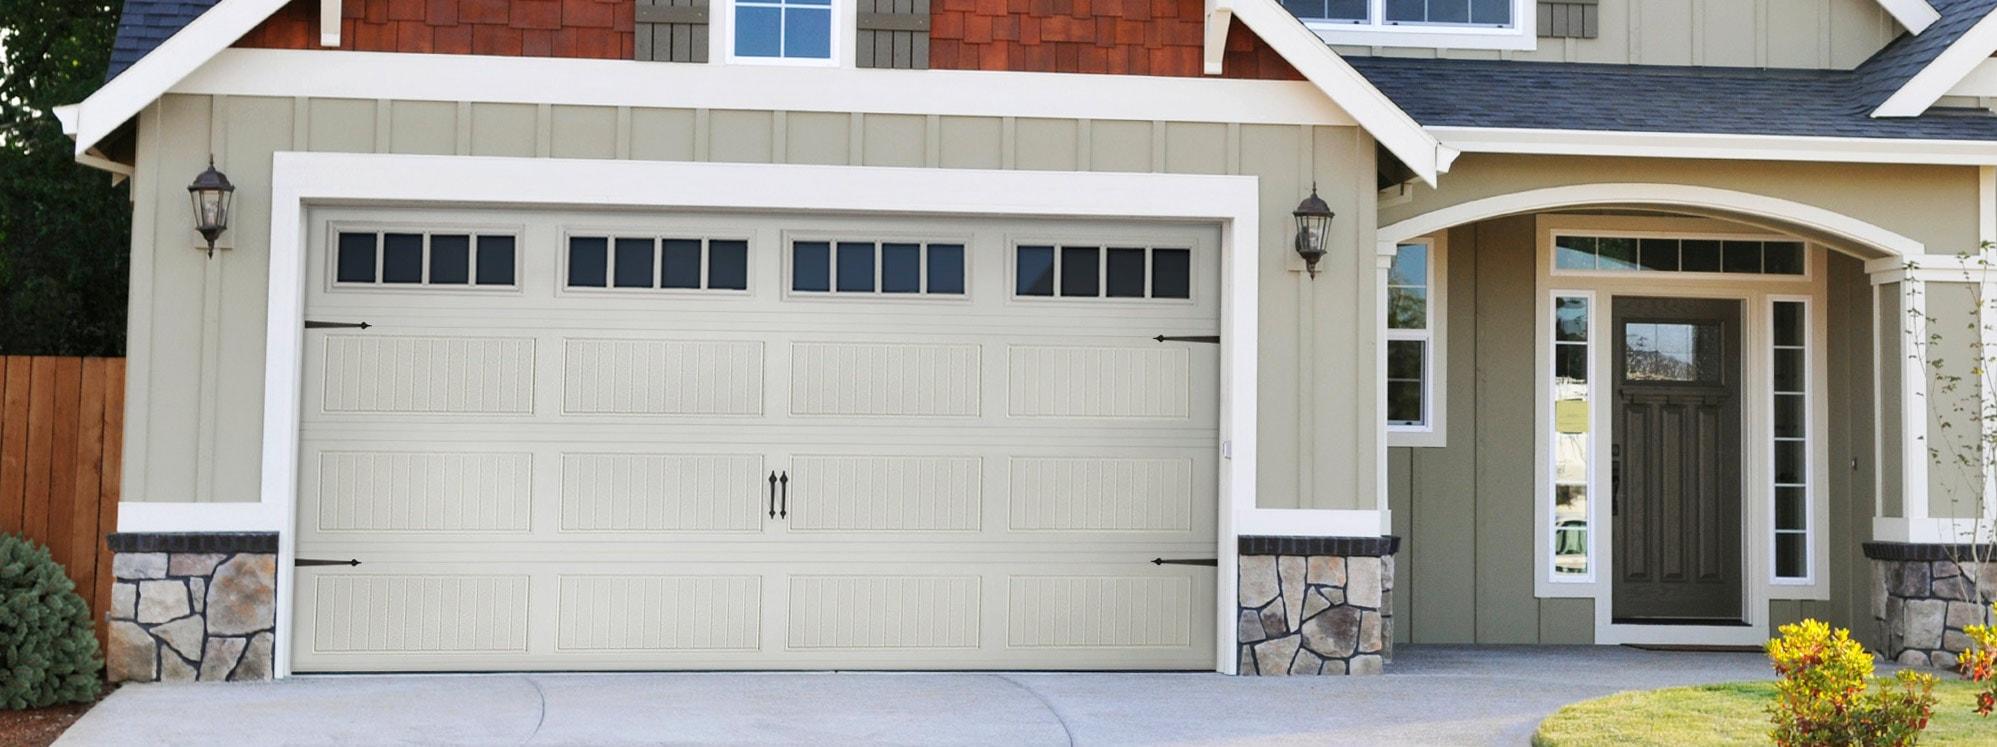 Gdr garage door repair buckeye az 623 236 2938 15 sc buckeye garage door rubansaba